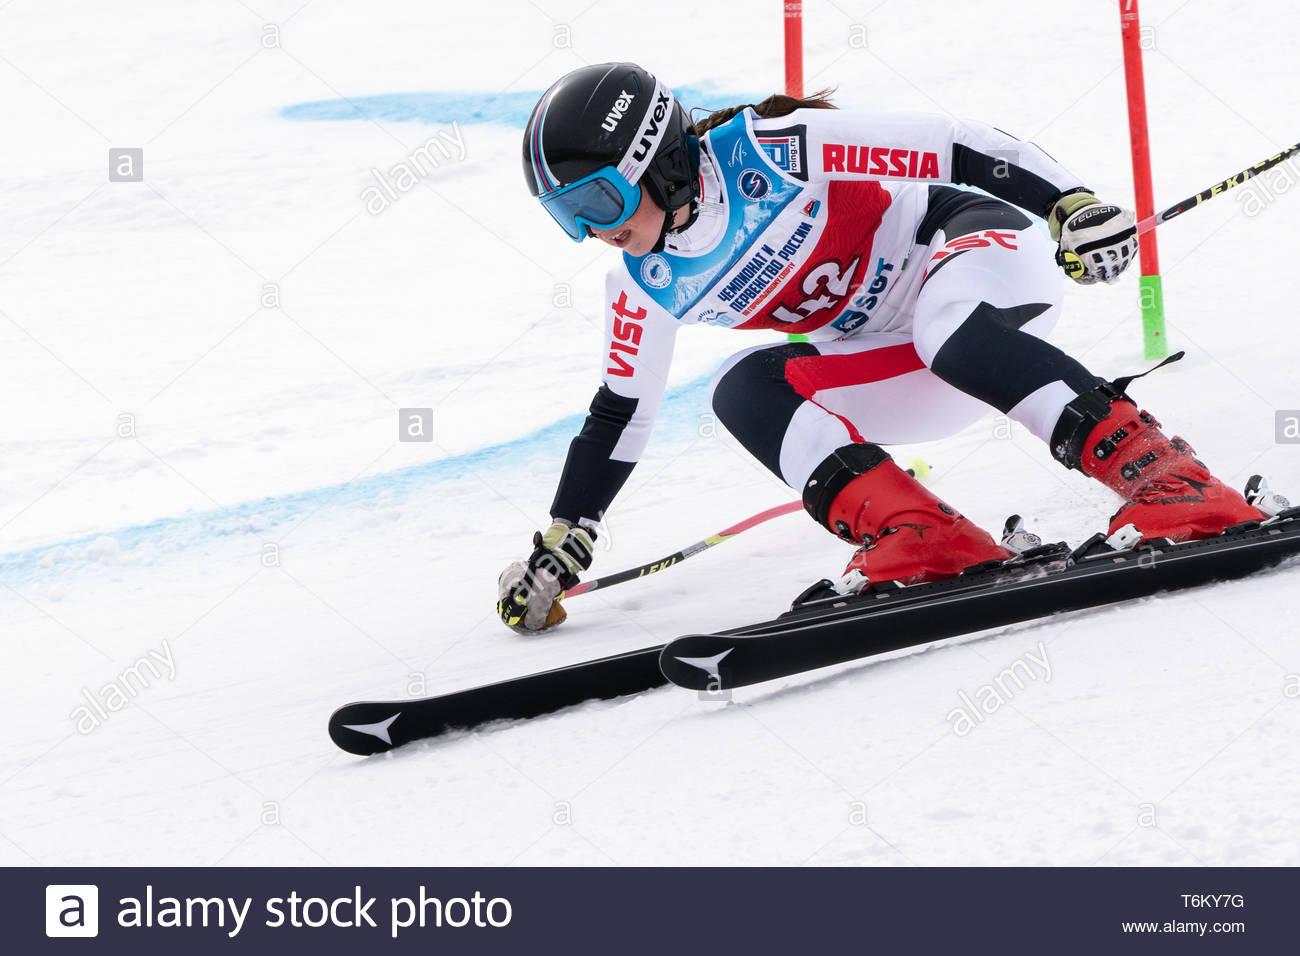 KAMCHATKA PENINSULA, RUSSIA - APRIL 2, 2019: Mountain skier Dyachenko Ellina (Sakhalin) skiing down mount. Russian Women's Alpine Skiing Cup, Internat - Stock Image